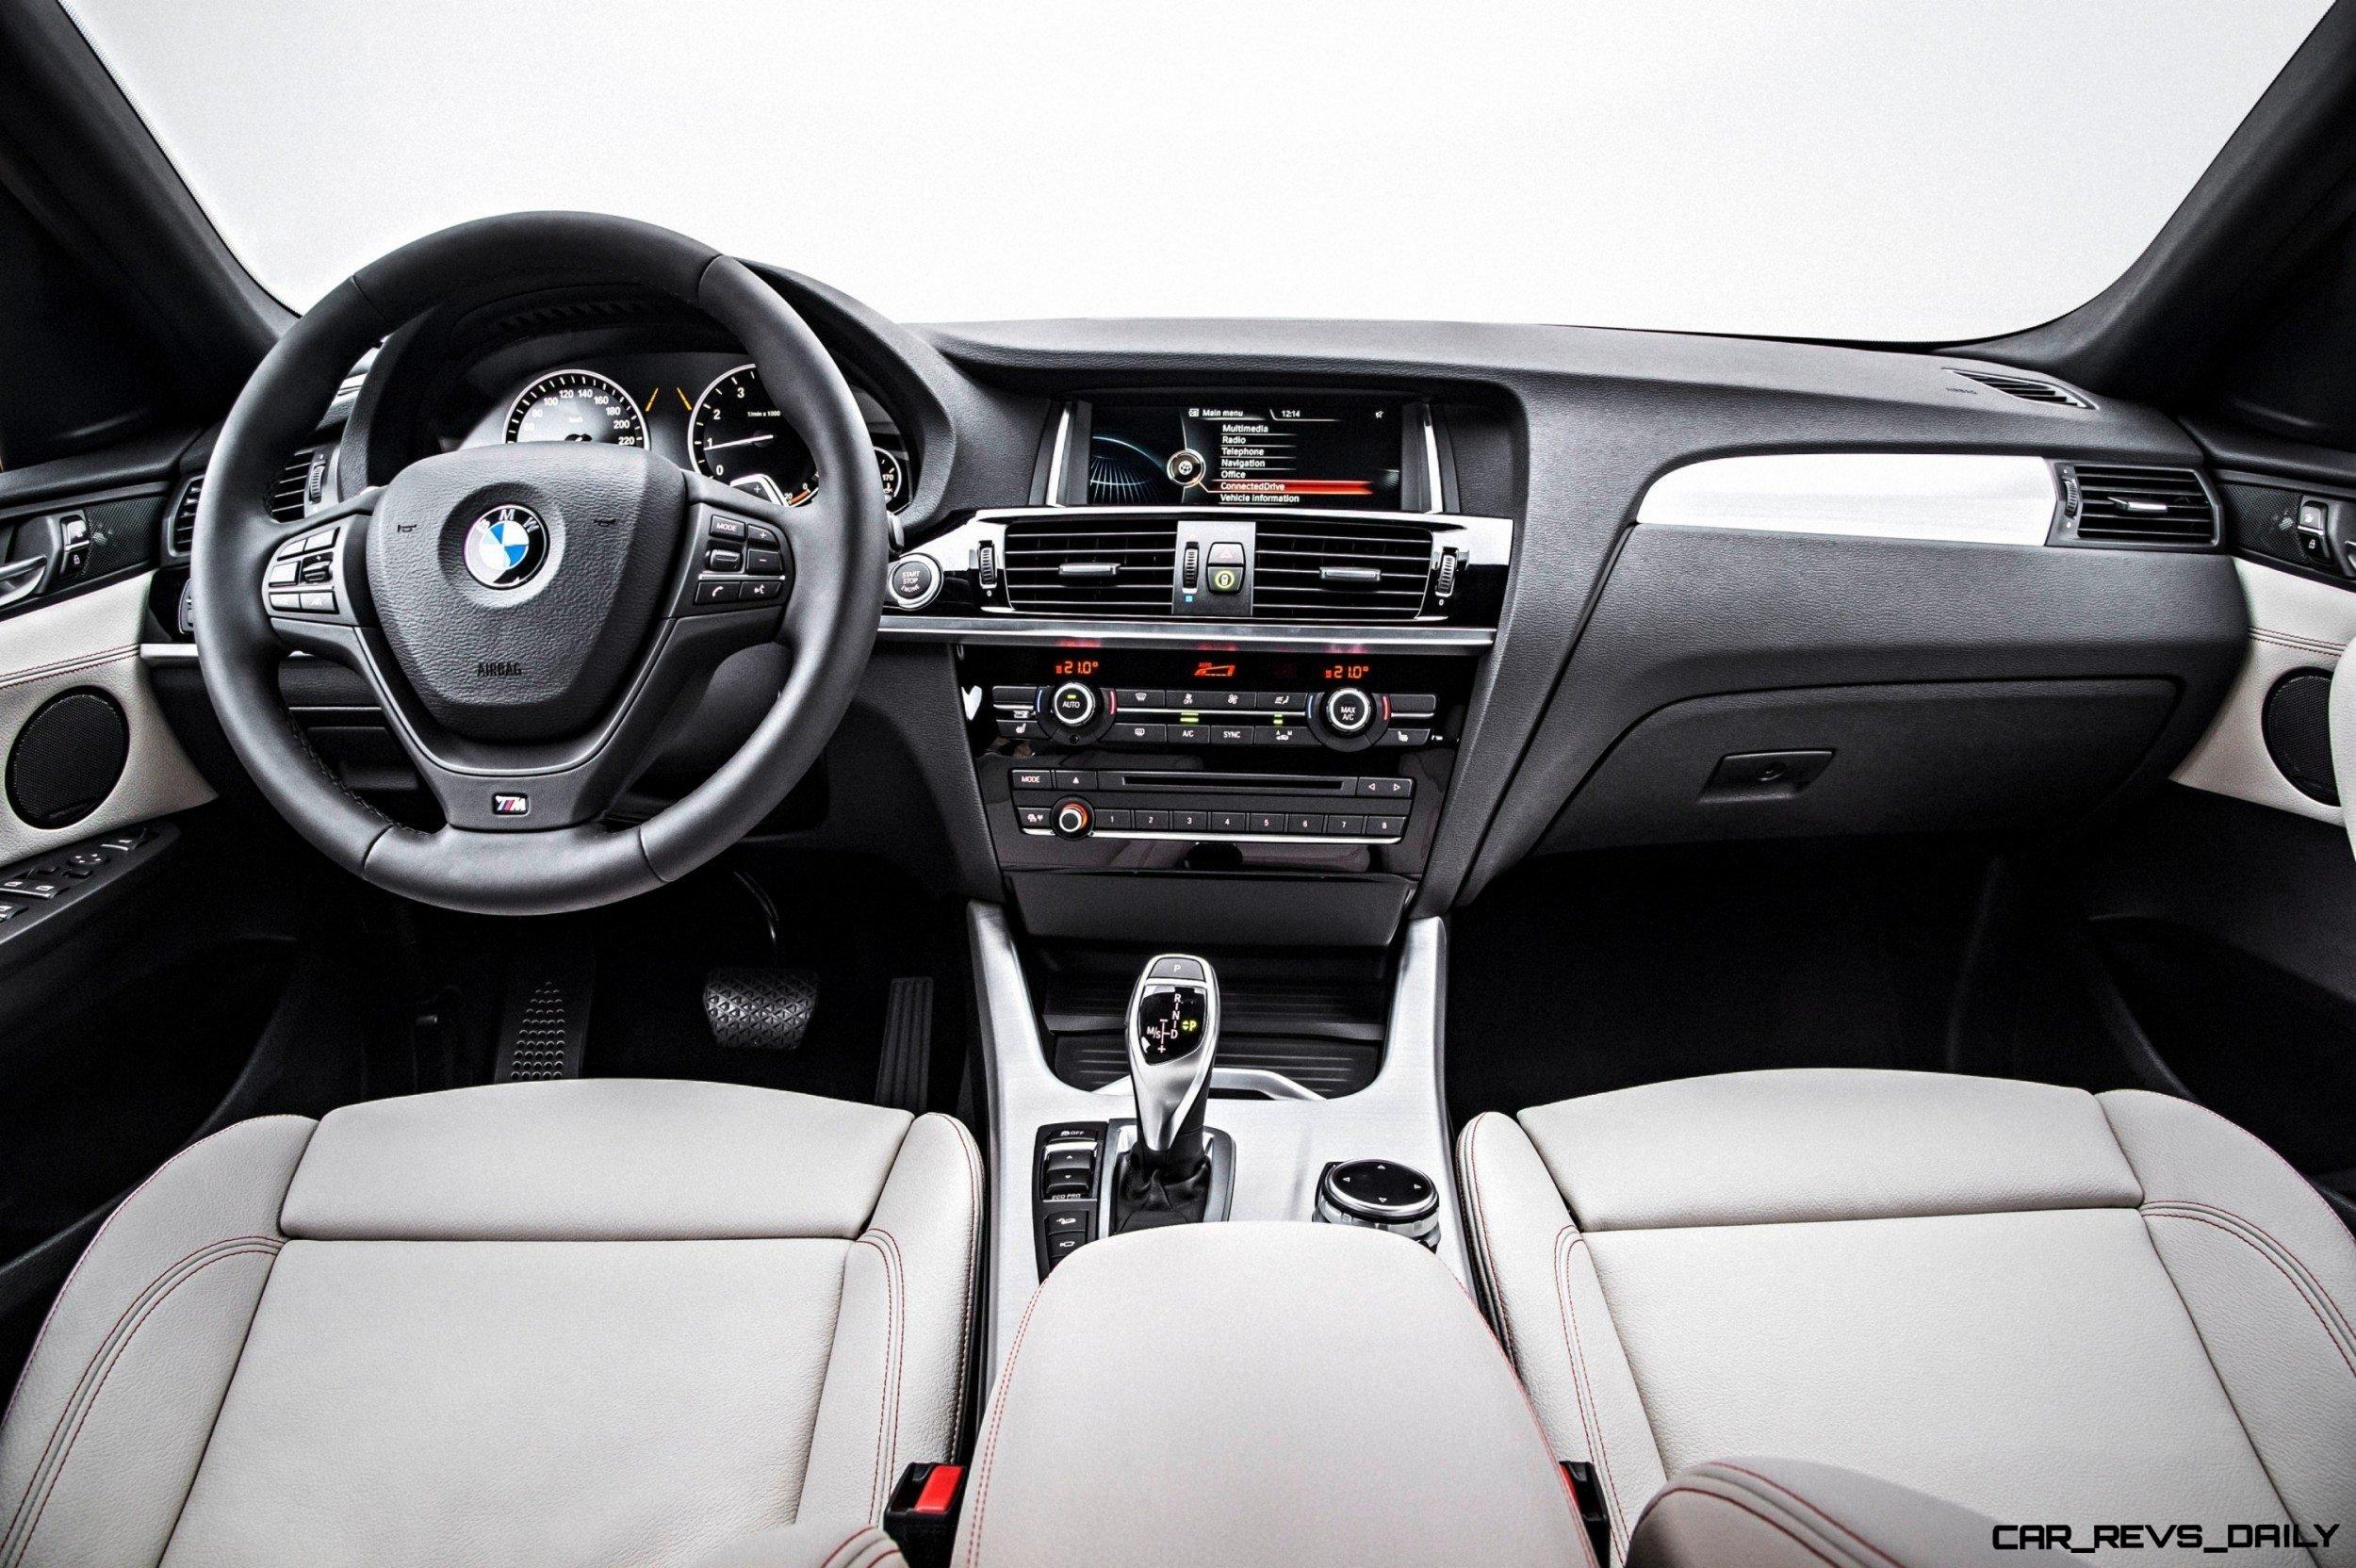 2015 BMW X4 Interior 8